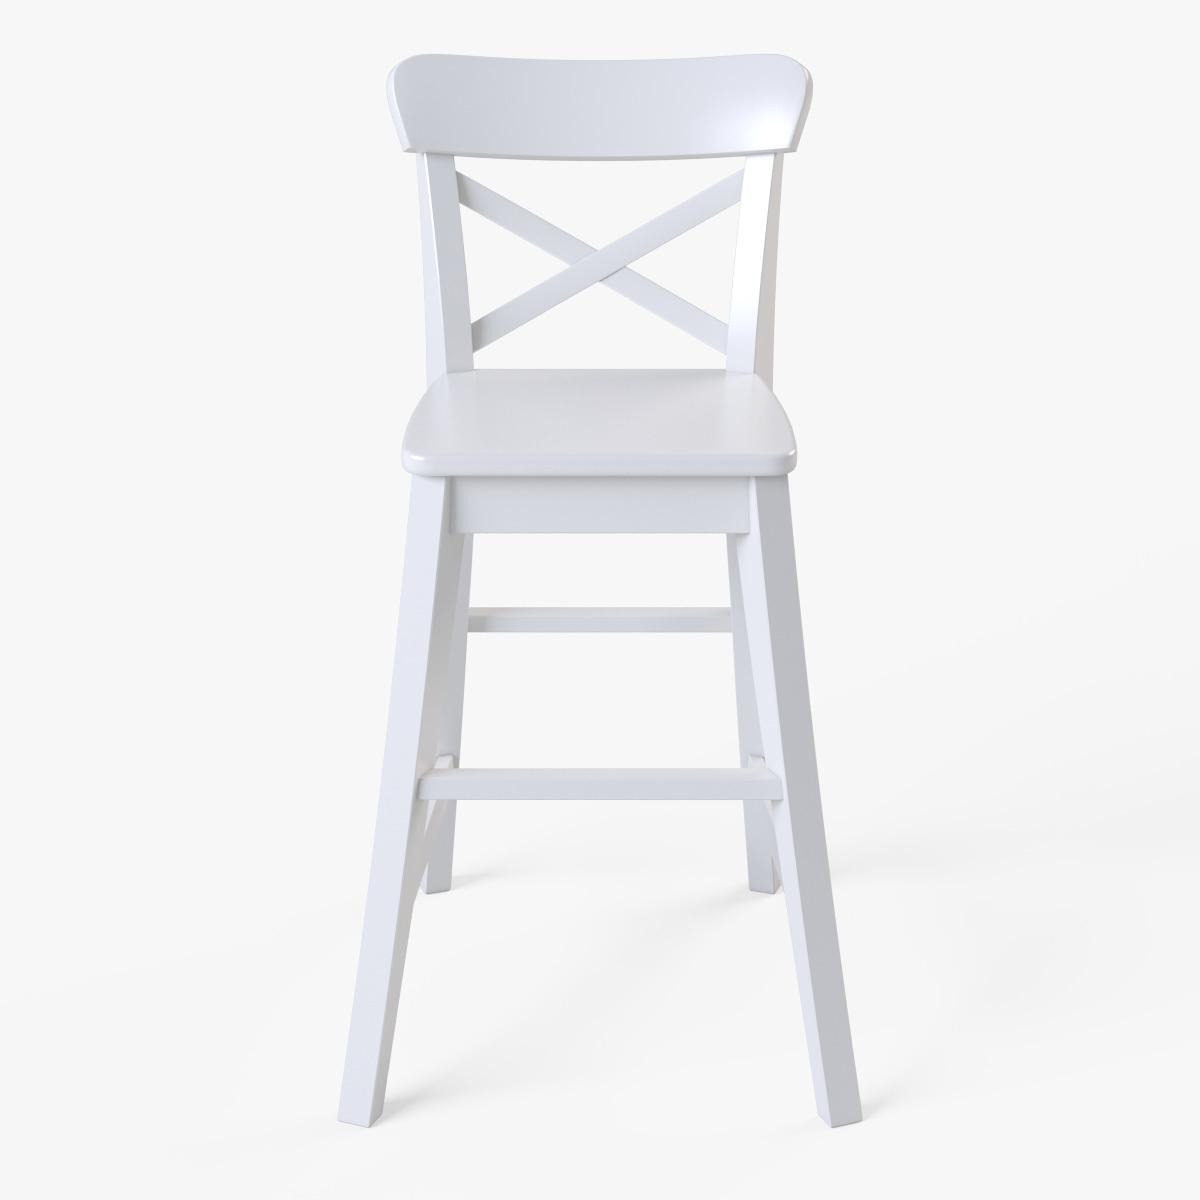 Junior Chair Ikea Ingolf White